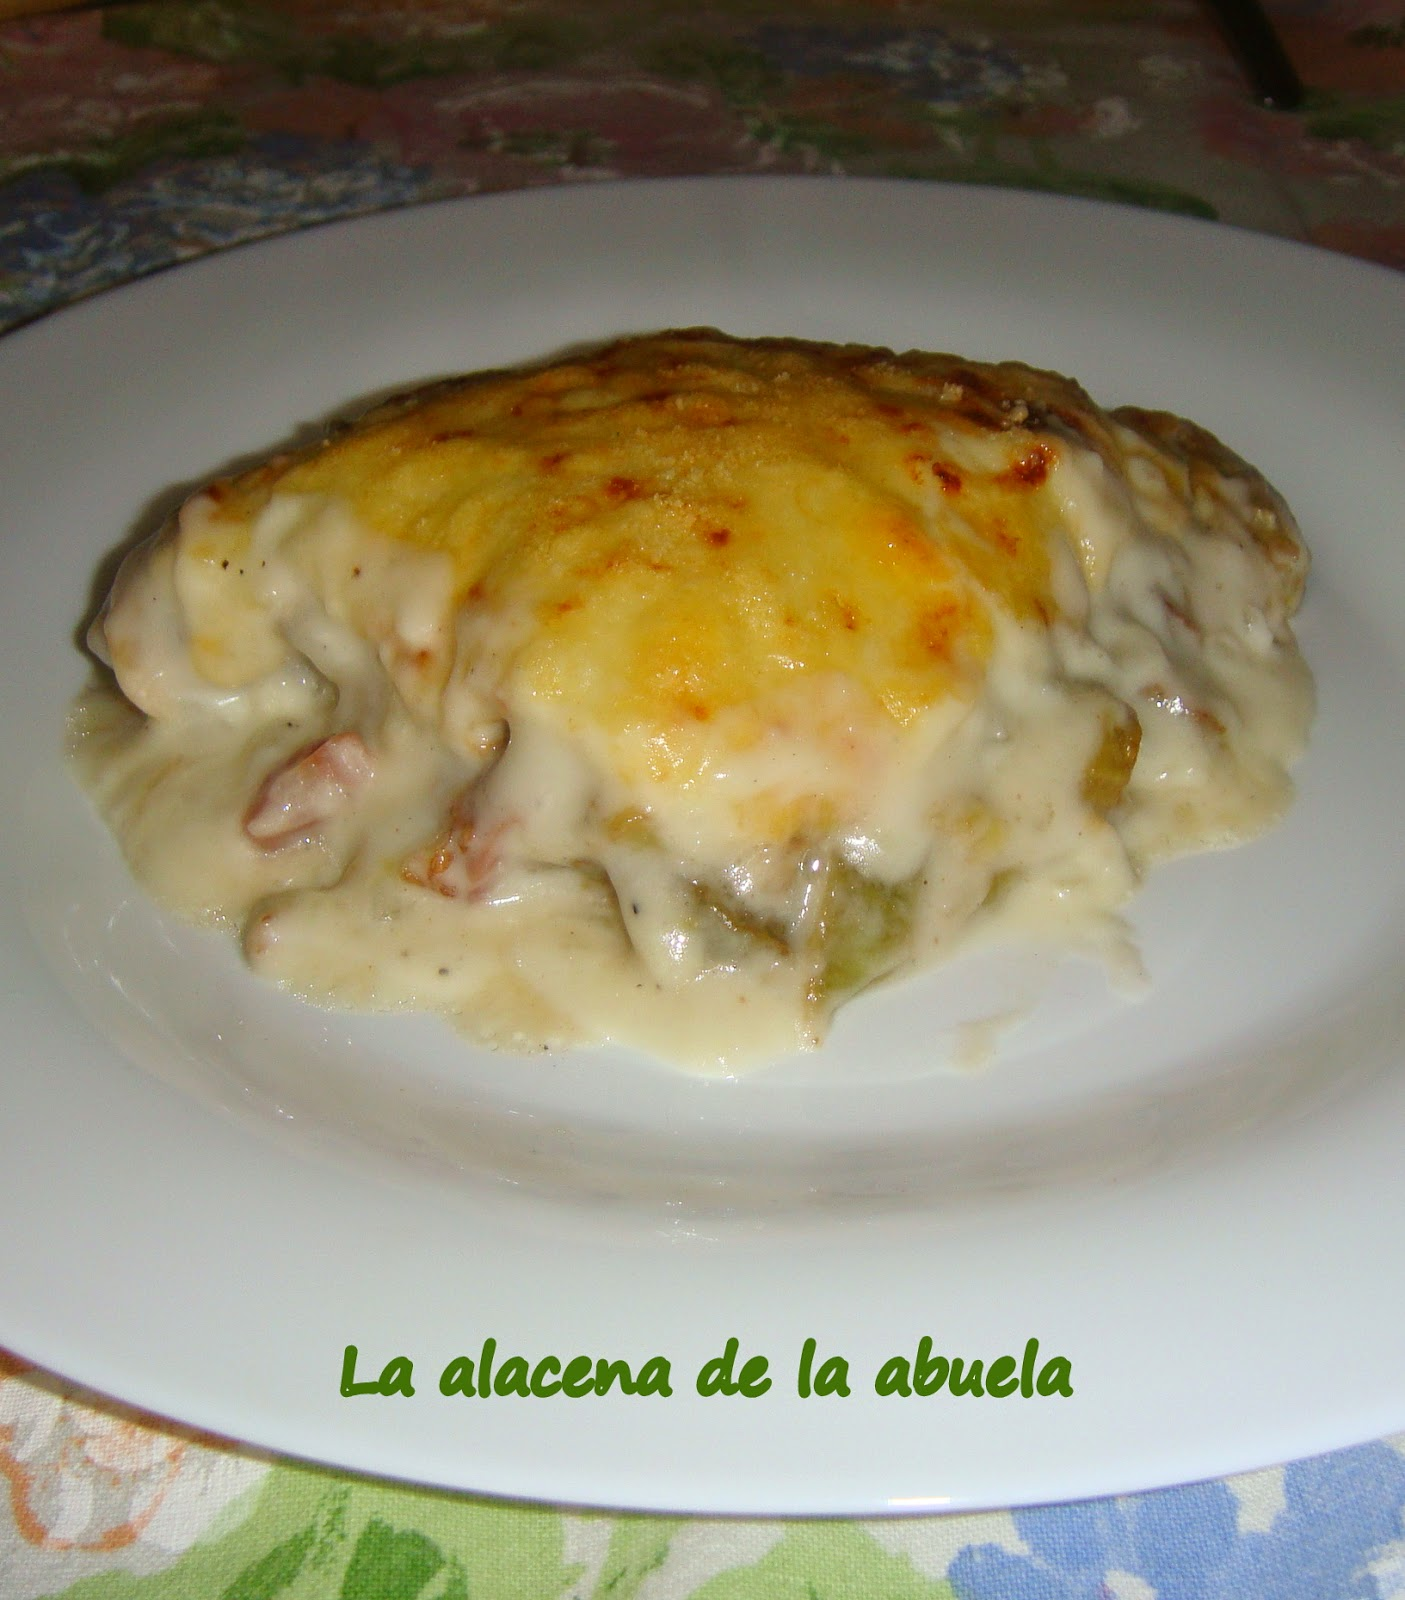 La alacena de la abuela carmen berenjenas a la crema for Cocina casera de la abuela